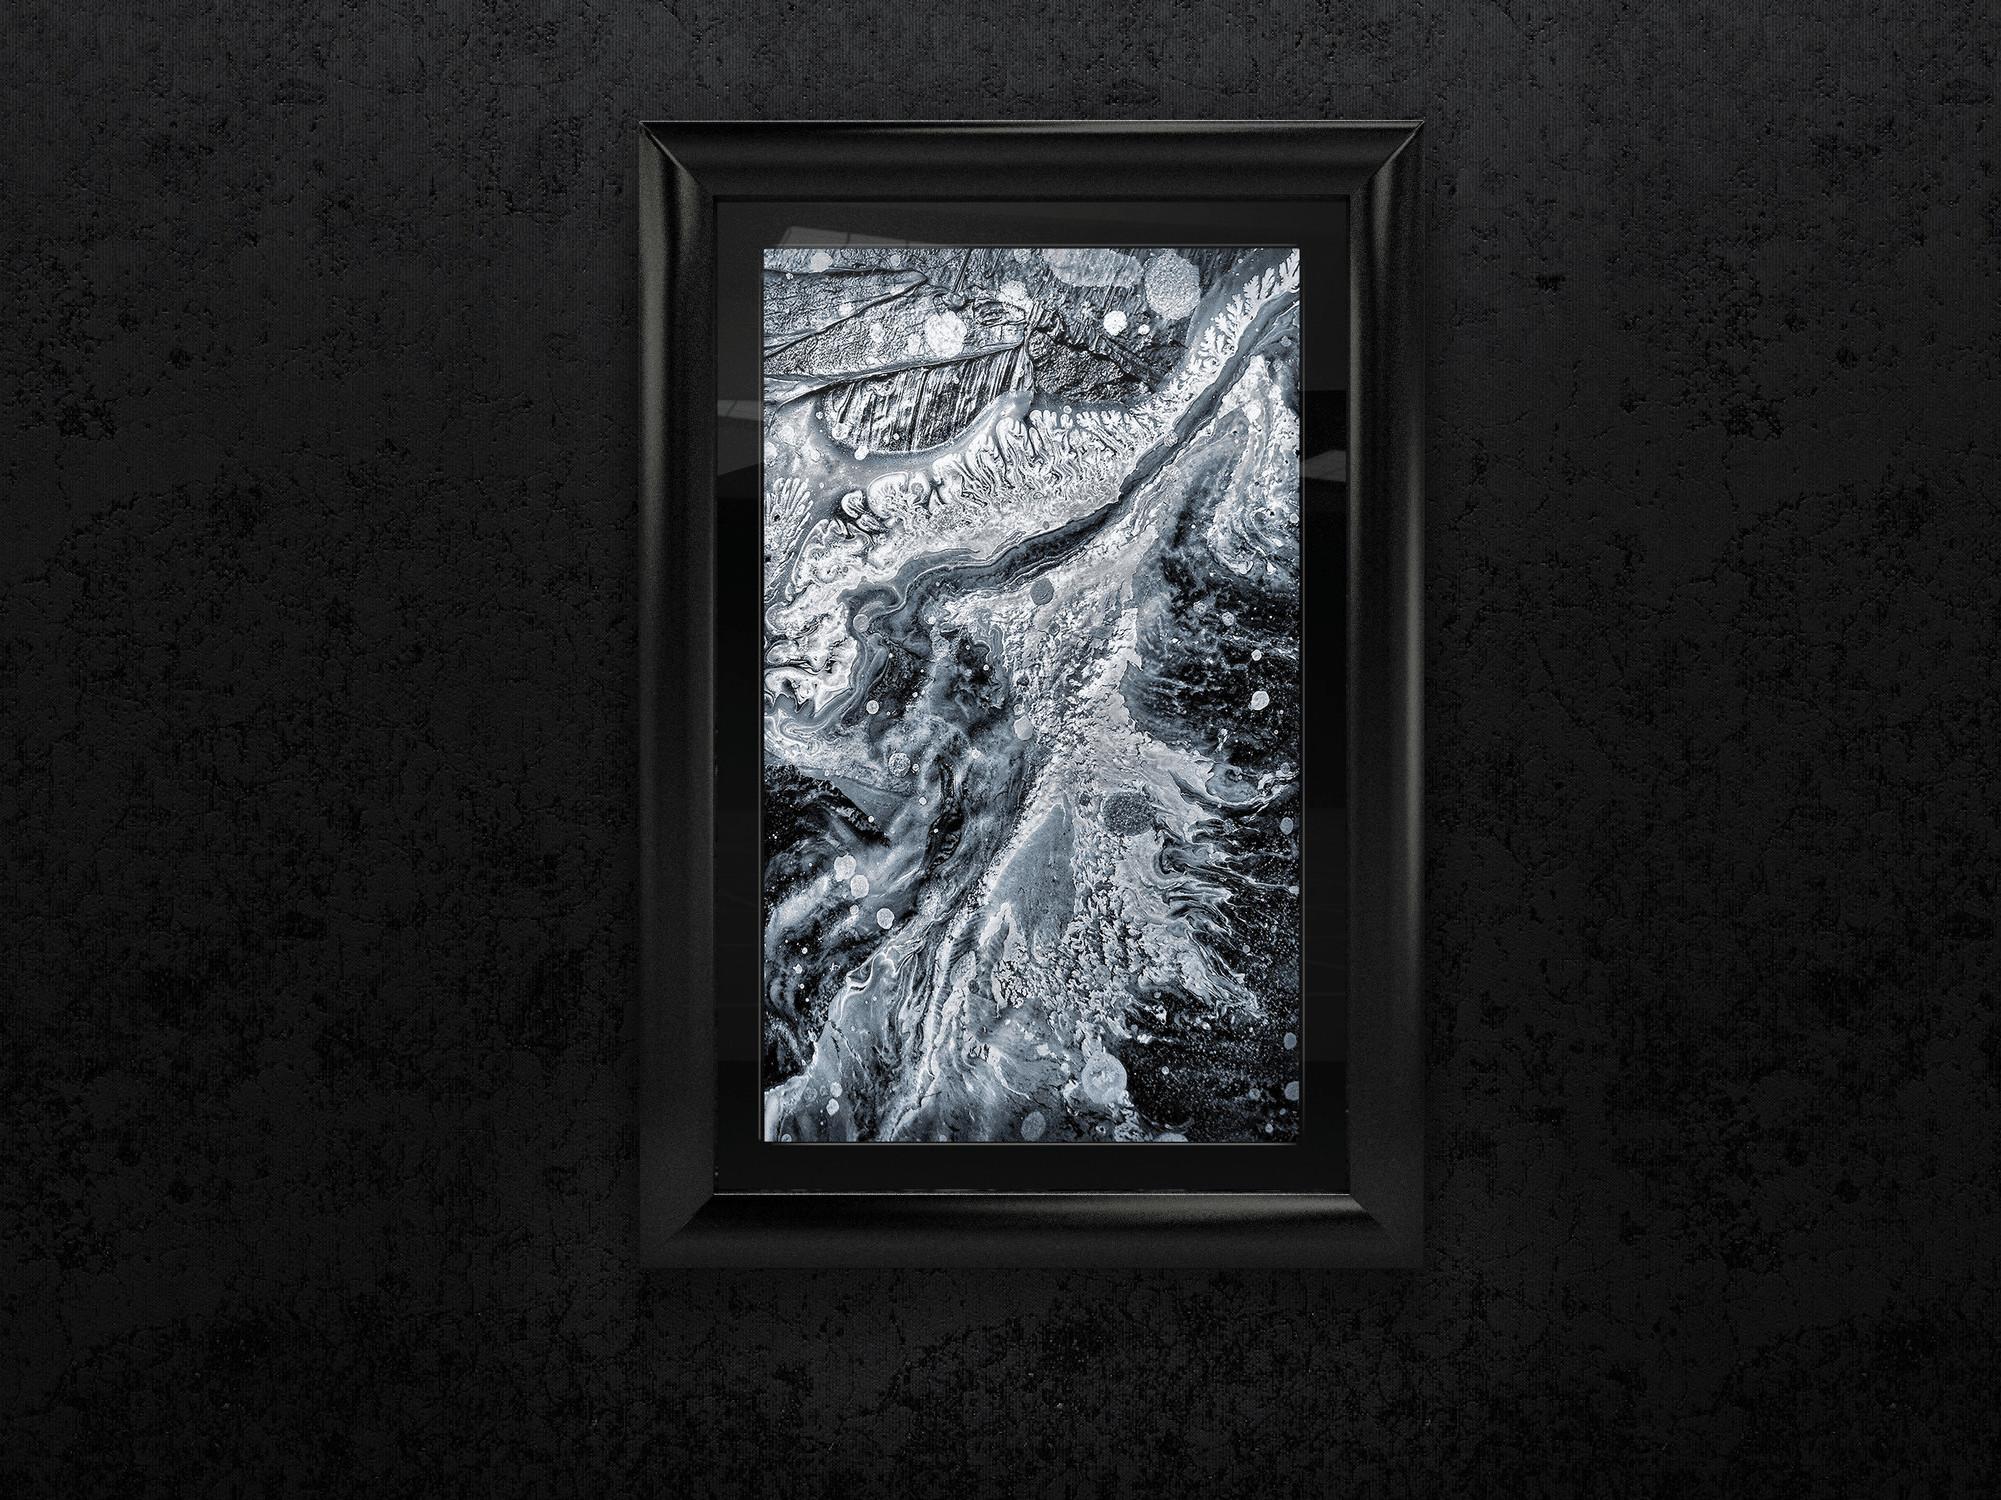 "<div class='title'>           Texture - Macro Photo with Frame         </div>                 <div class='description'>           12""x8"" black and white macro photo by Cameron Emmanuel         </div>"